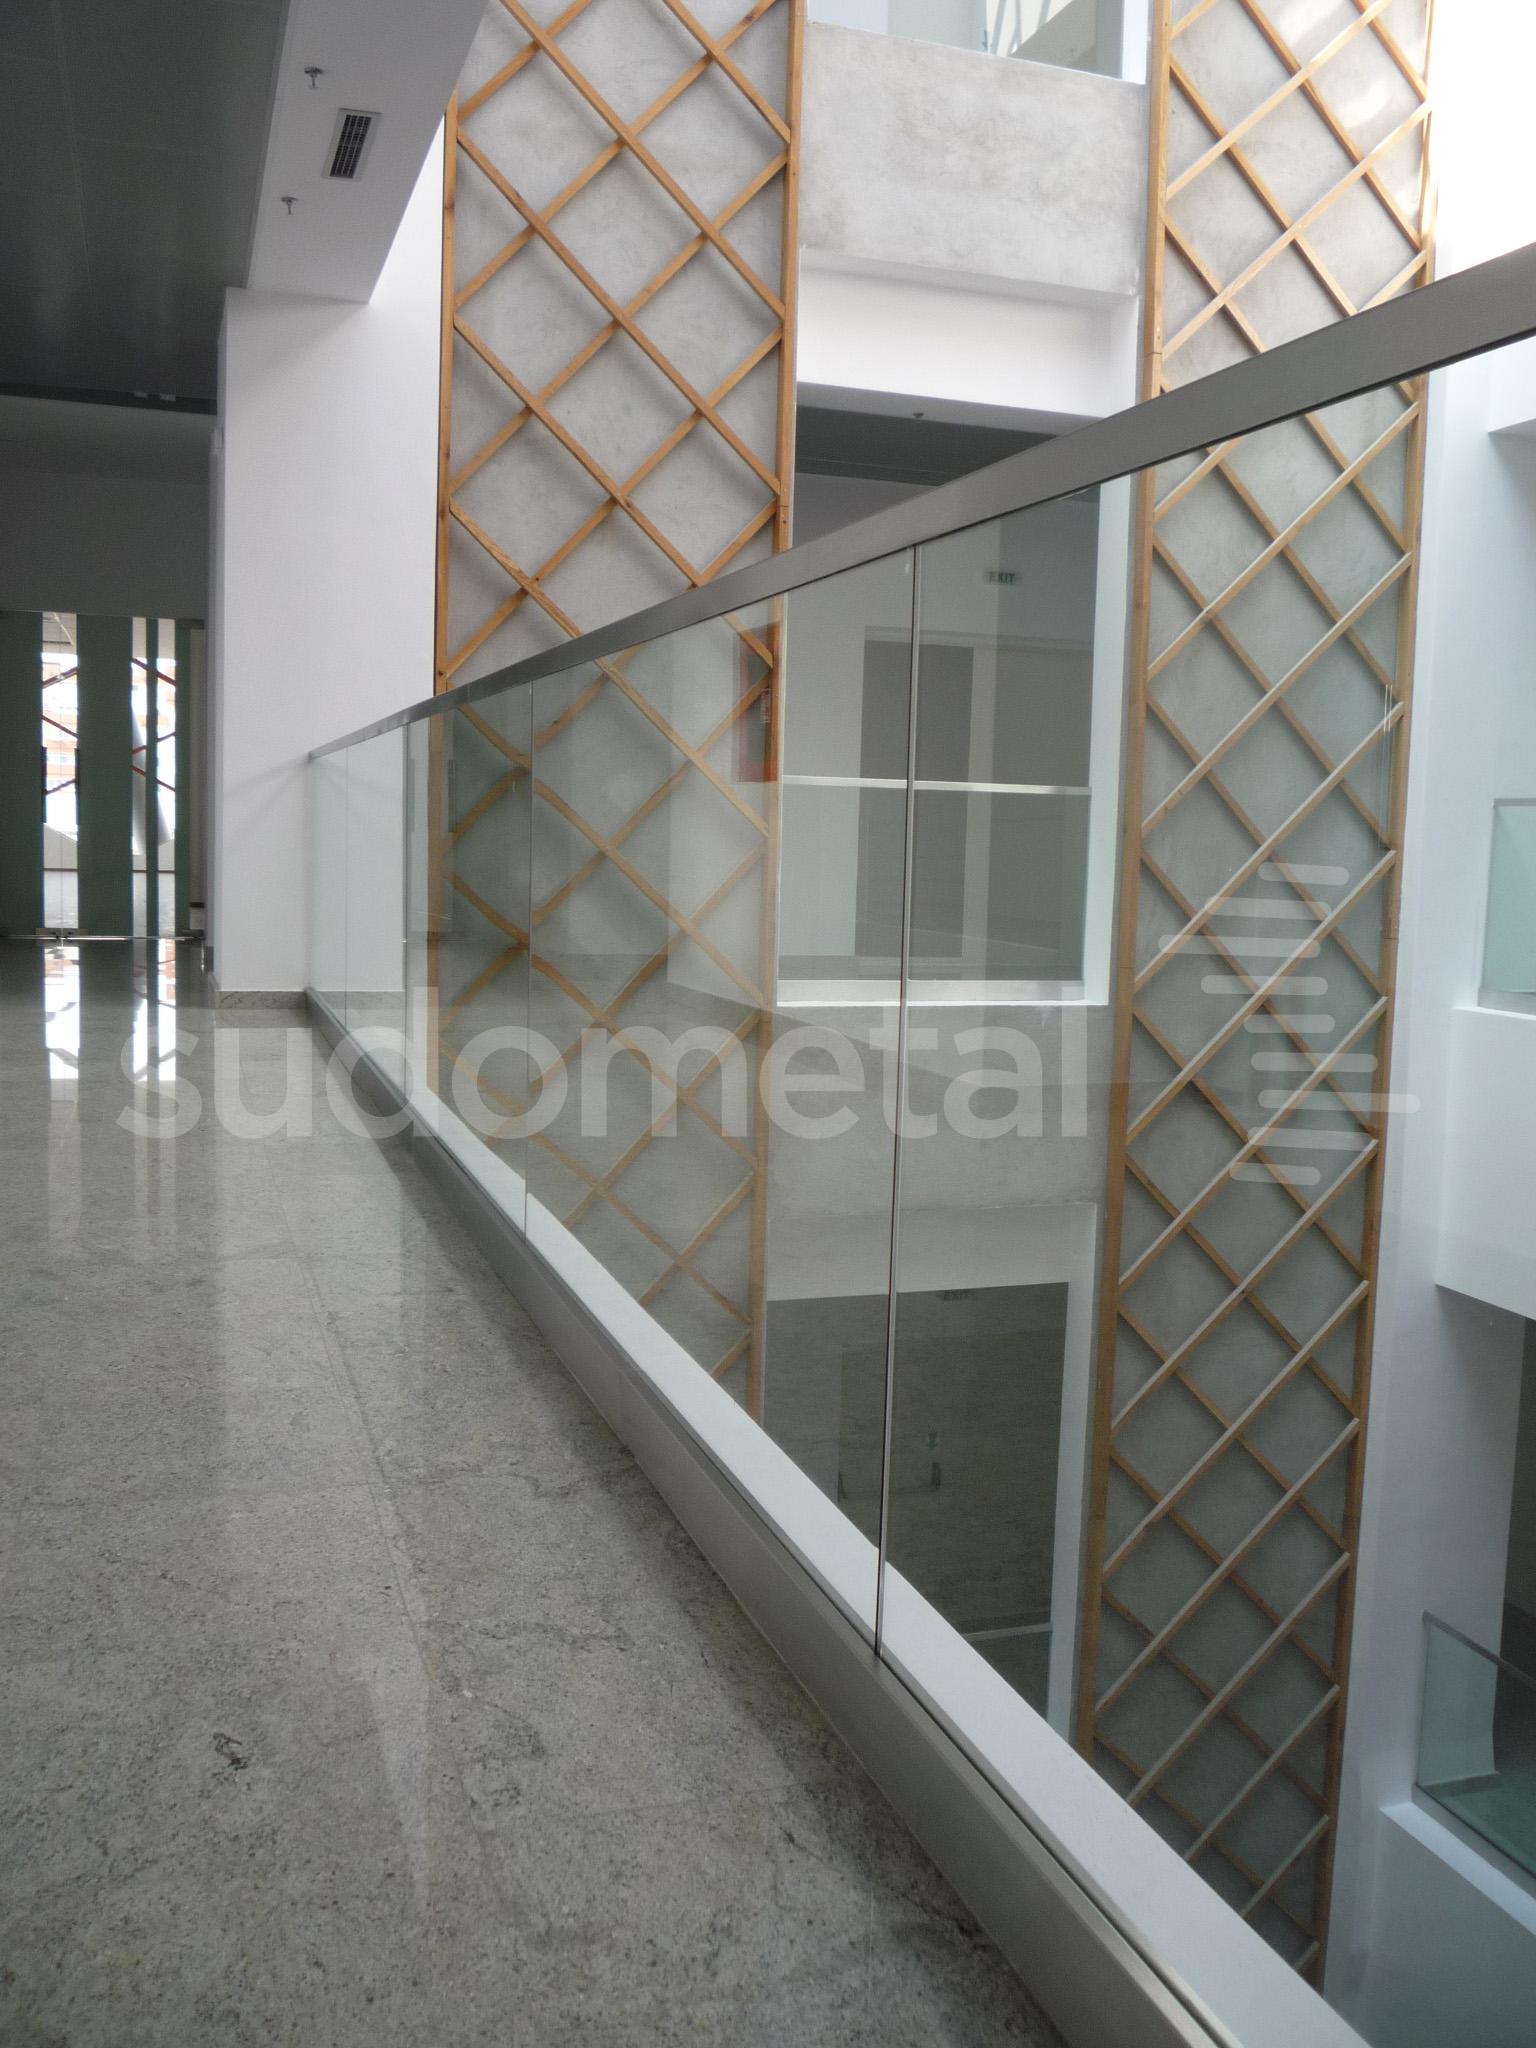 Balustrade din sticla - Balustrada cladire de birouri 30 Avenue, Bacau SUDOMETAL - Poza 4